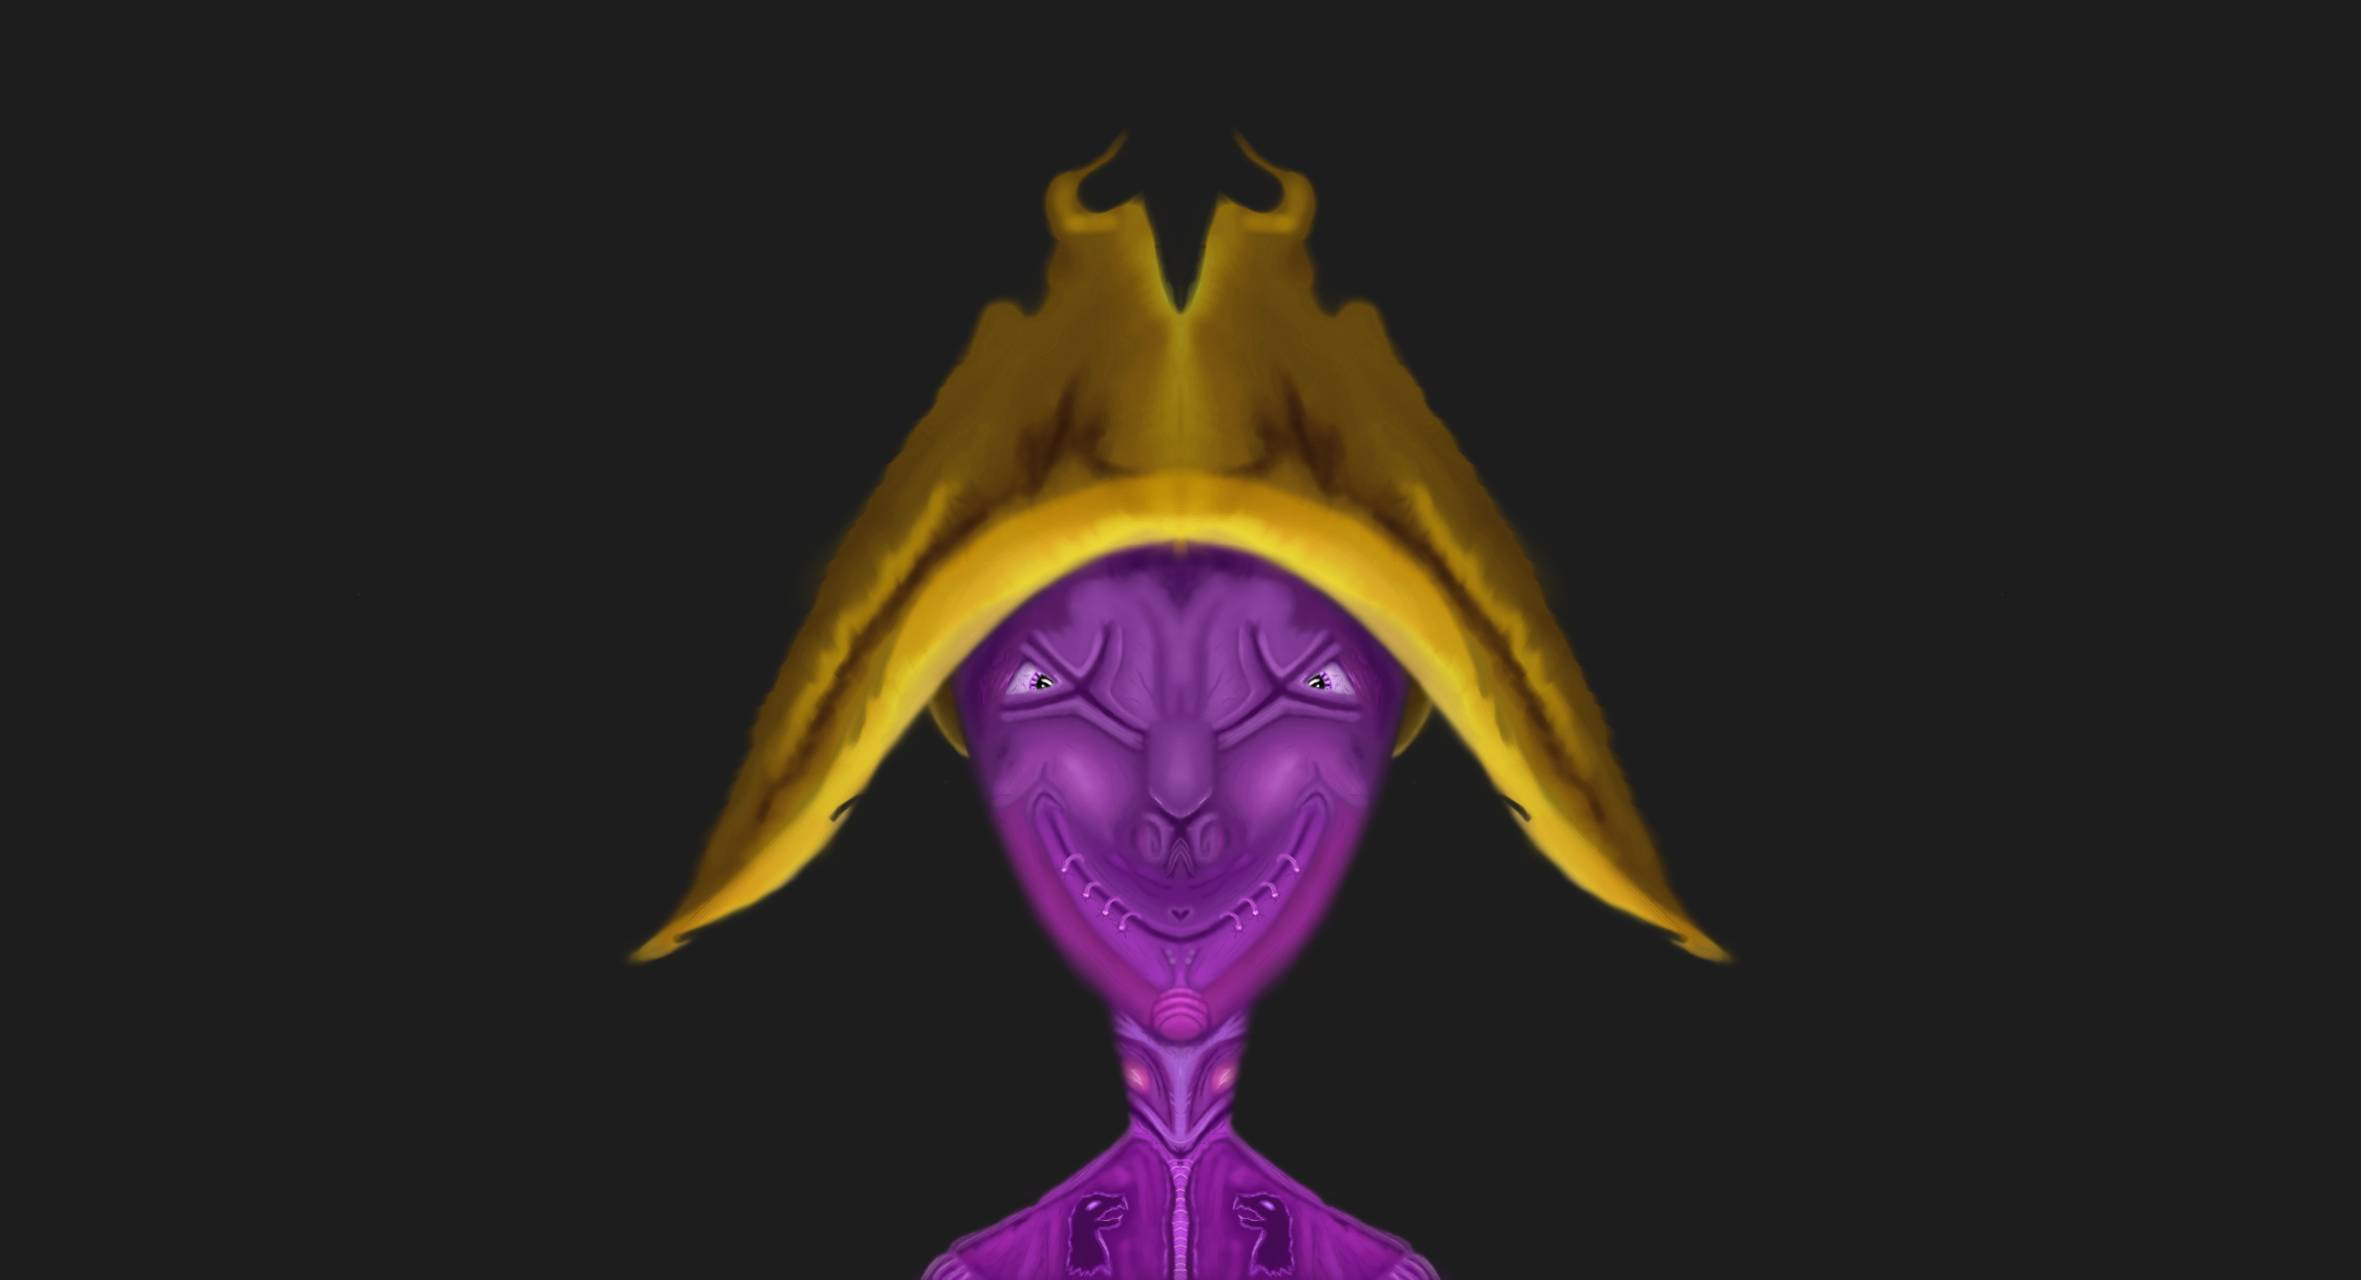 The perpel Goblin